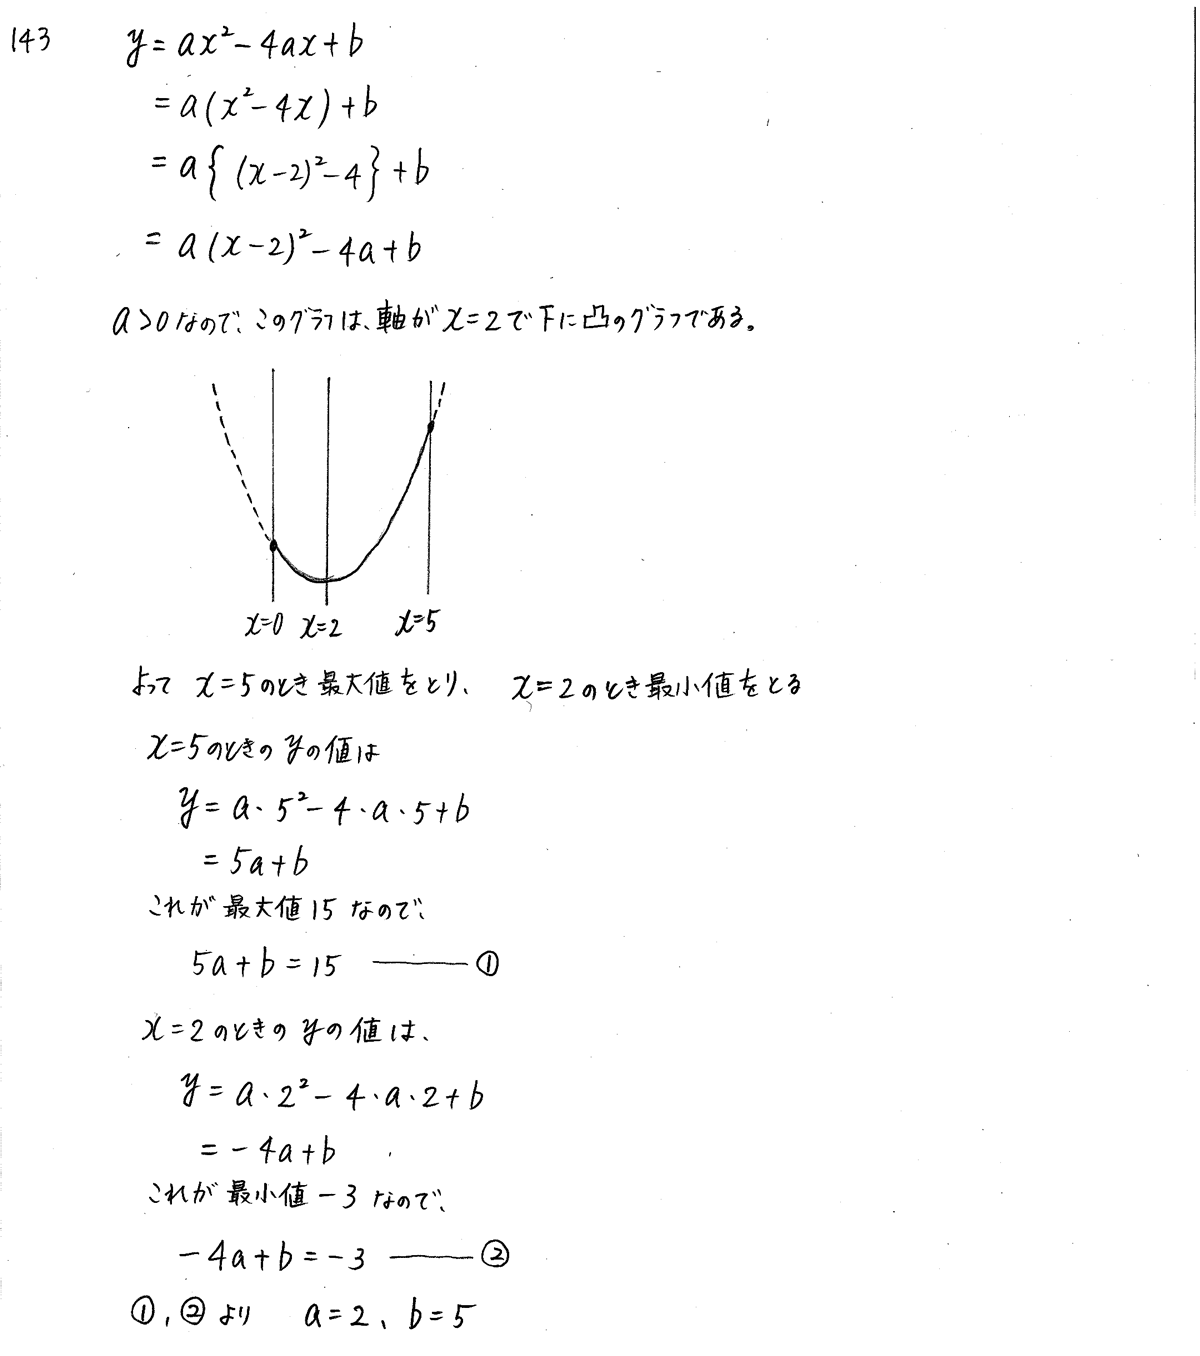 3TRIAL数学1-143解答